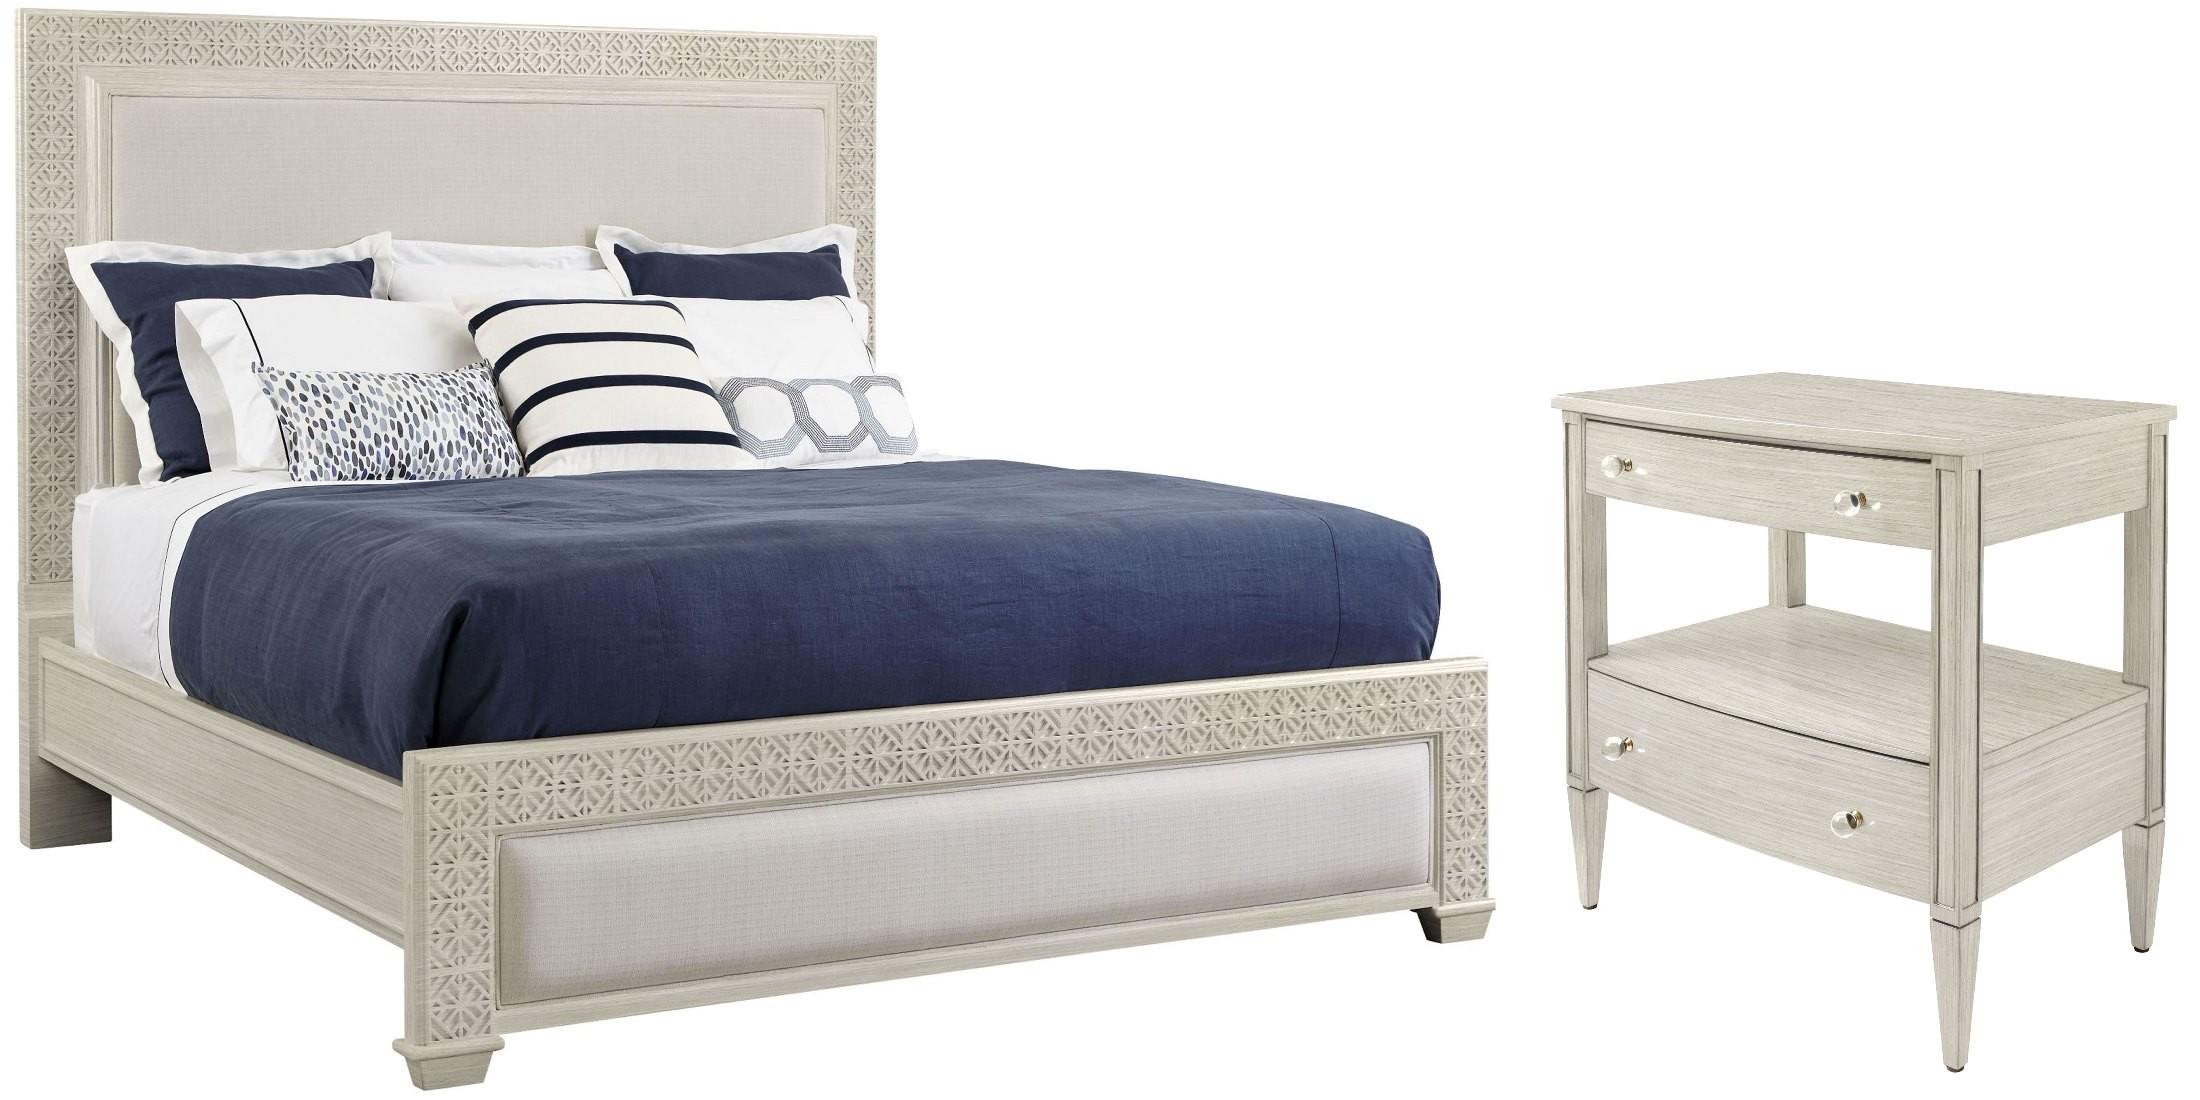 Coastal Living Oasis Oyster Catalina Panel Bedroom Set From Coastal Living Coleman Furniture